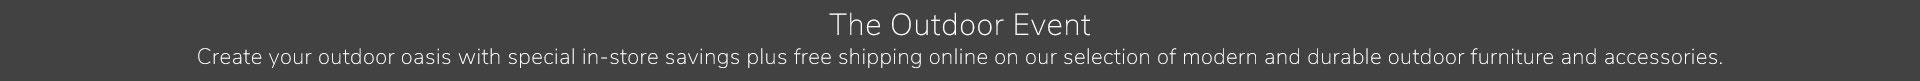 oustdoor-spring-2019-promo-banner.jpg